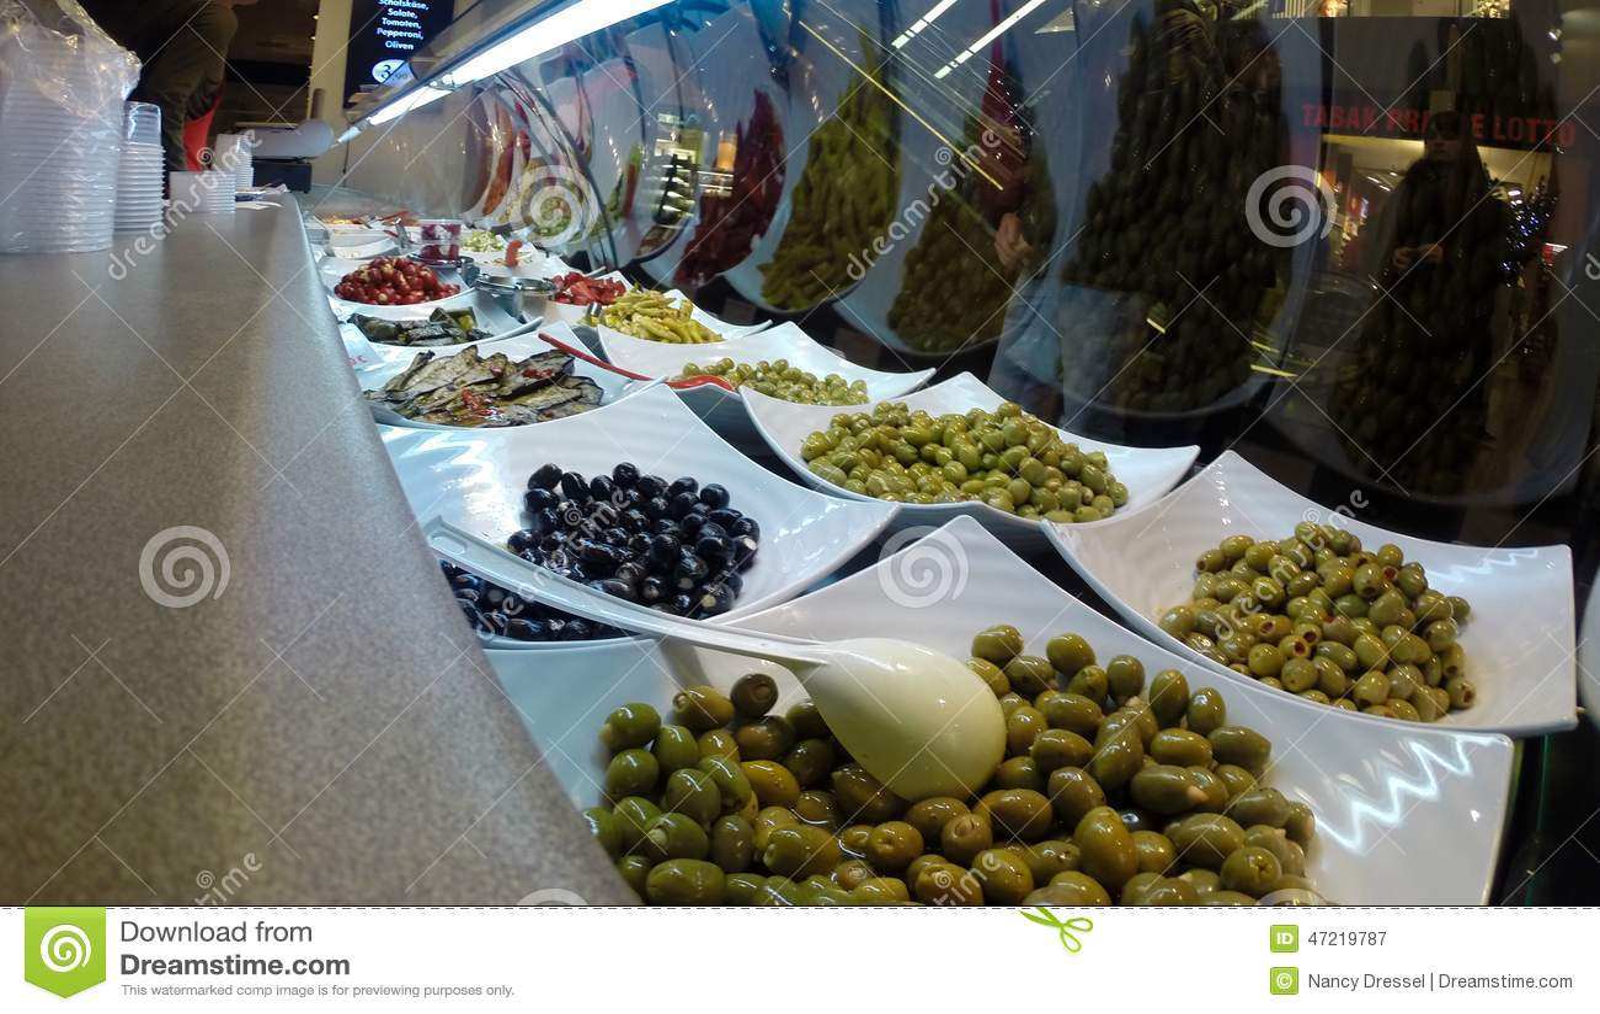 Healthy Food From Mr Greek